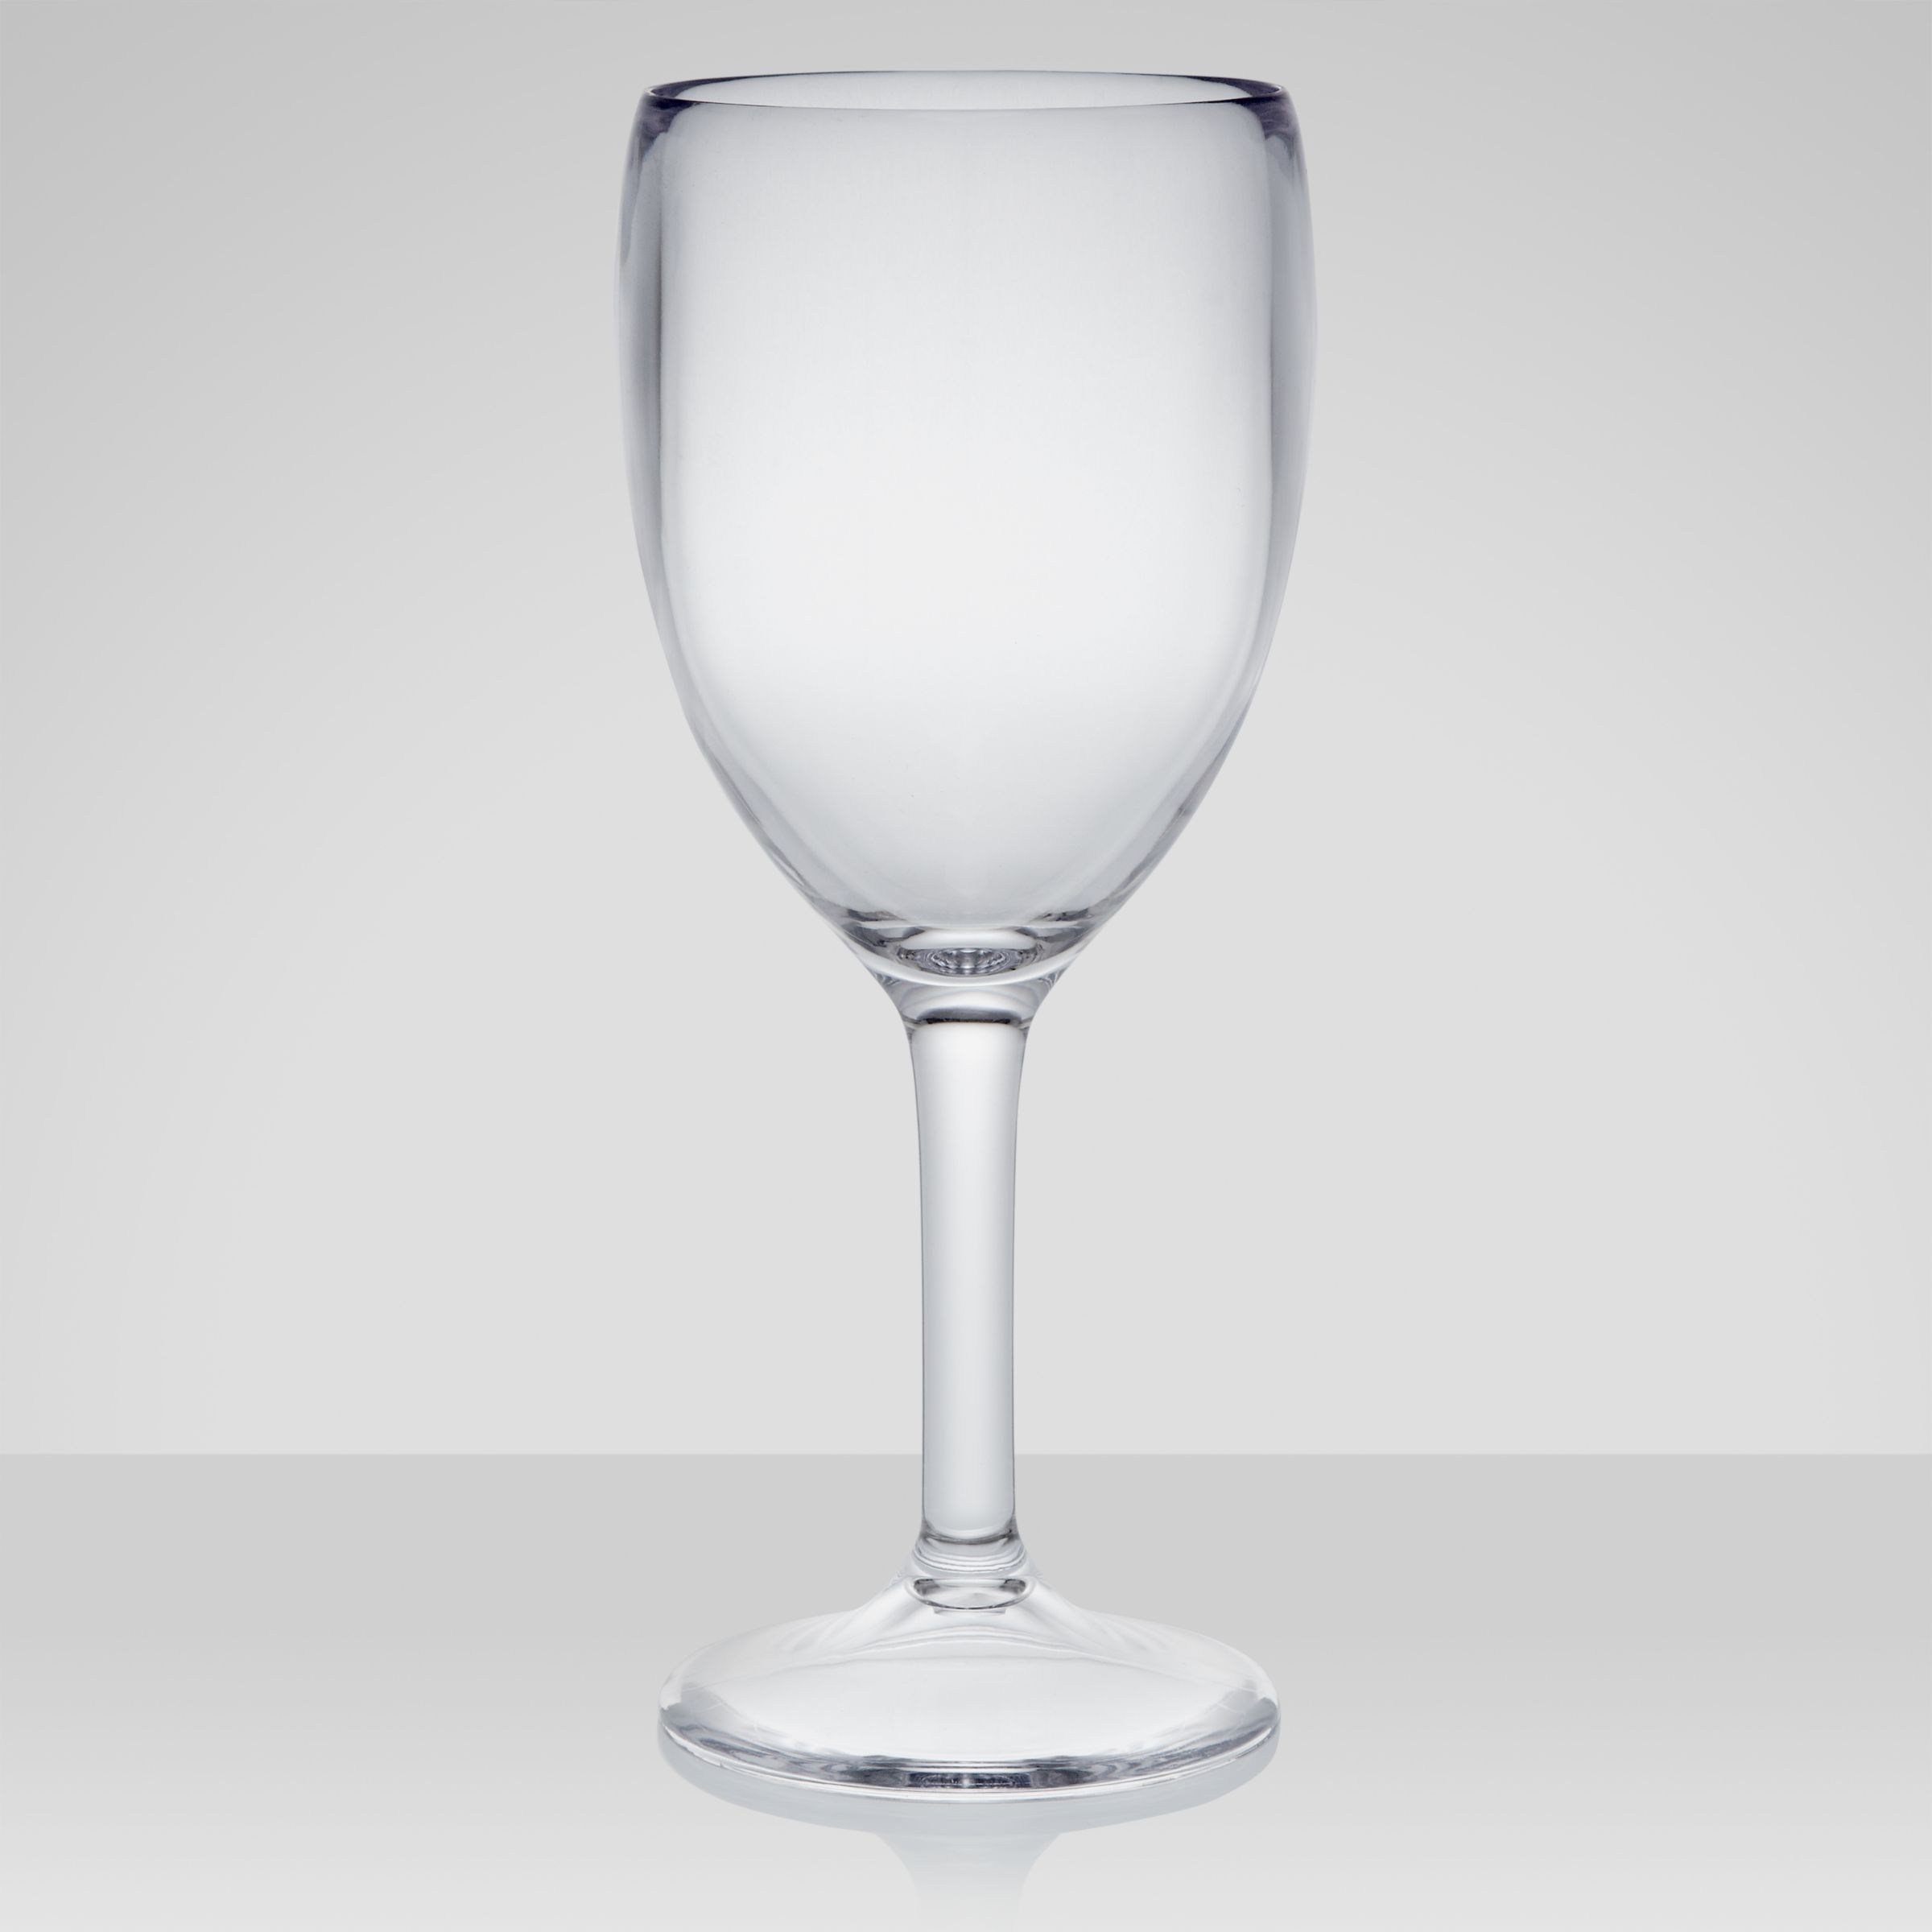 John Lewis Wine Glasses, Set of 4